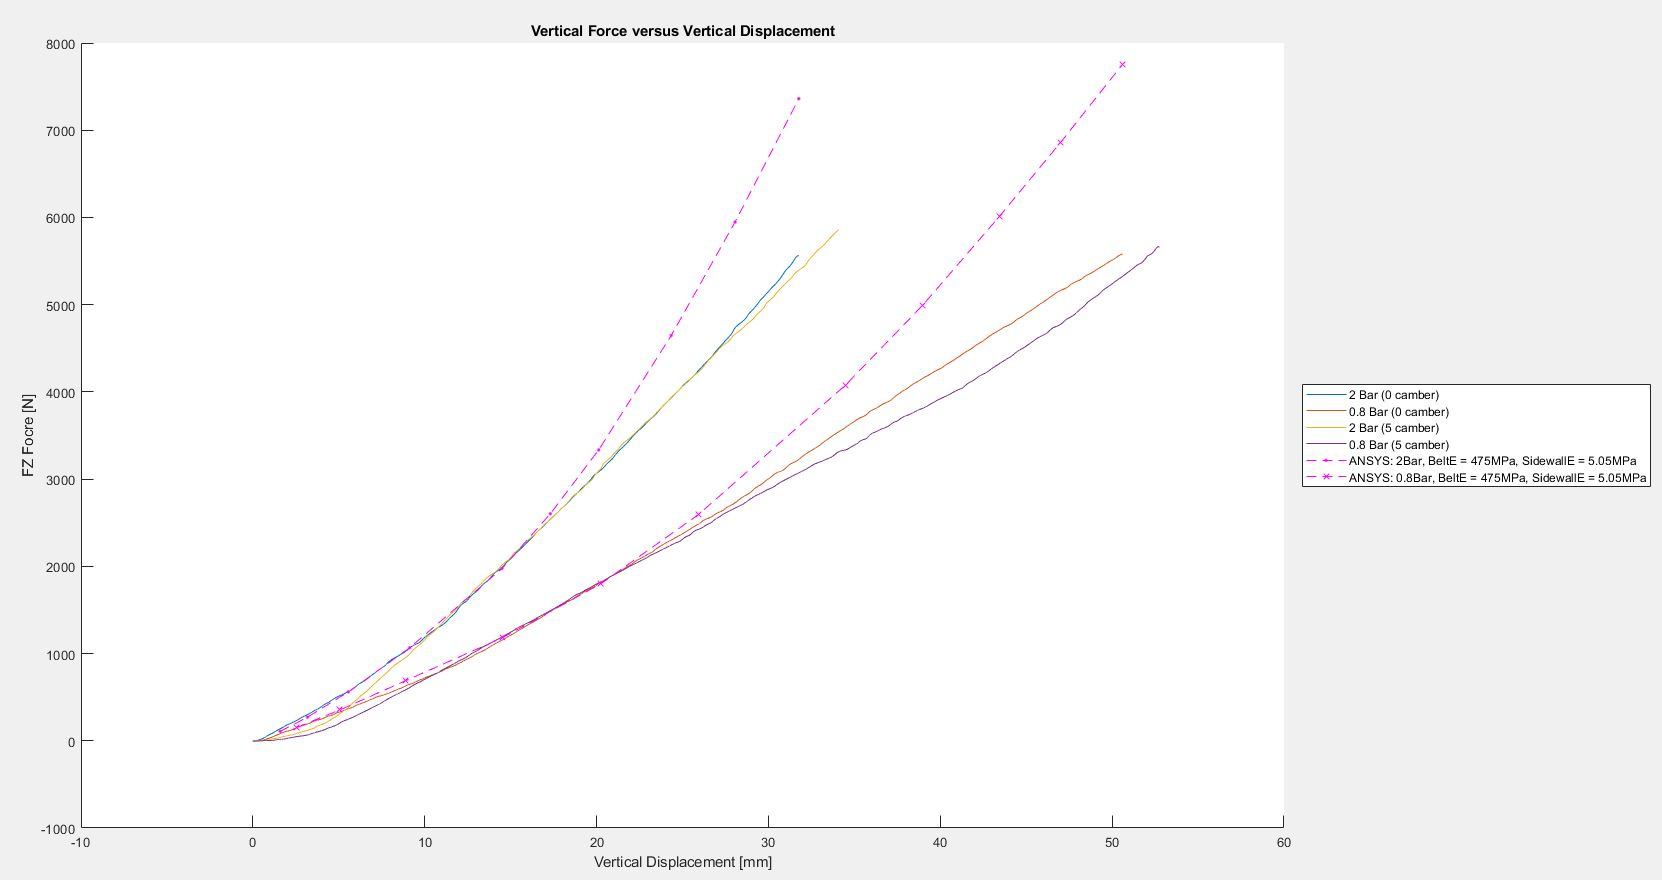 TM700_VerticalDisp_vs_VertialForce_10292020.JPG